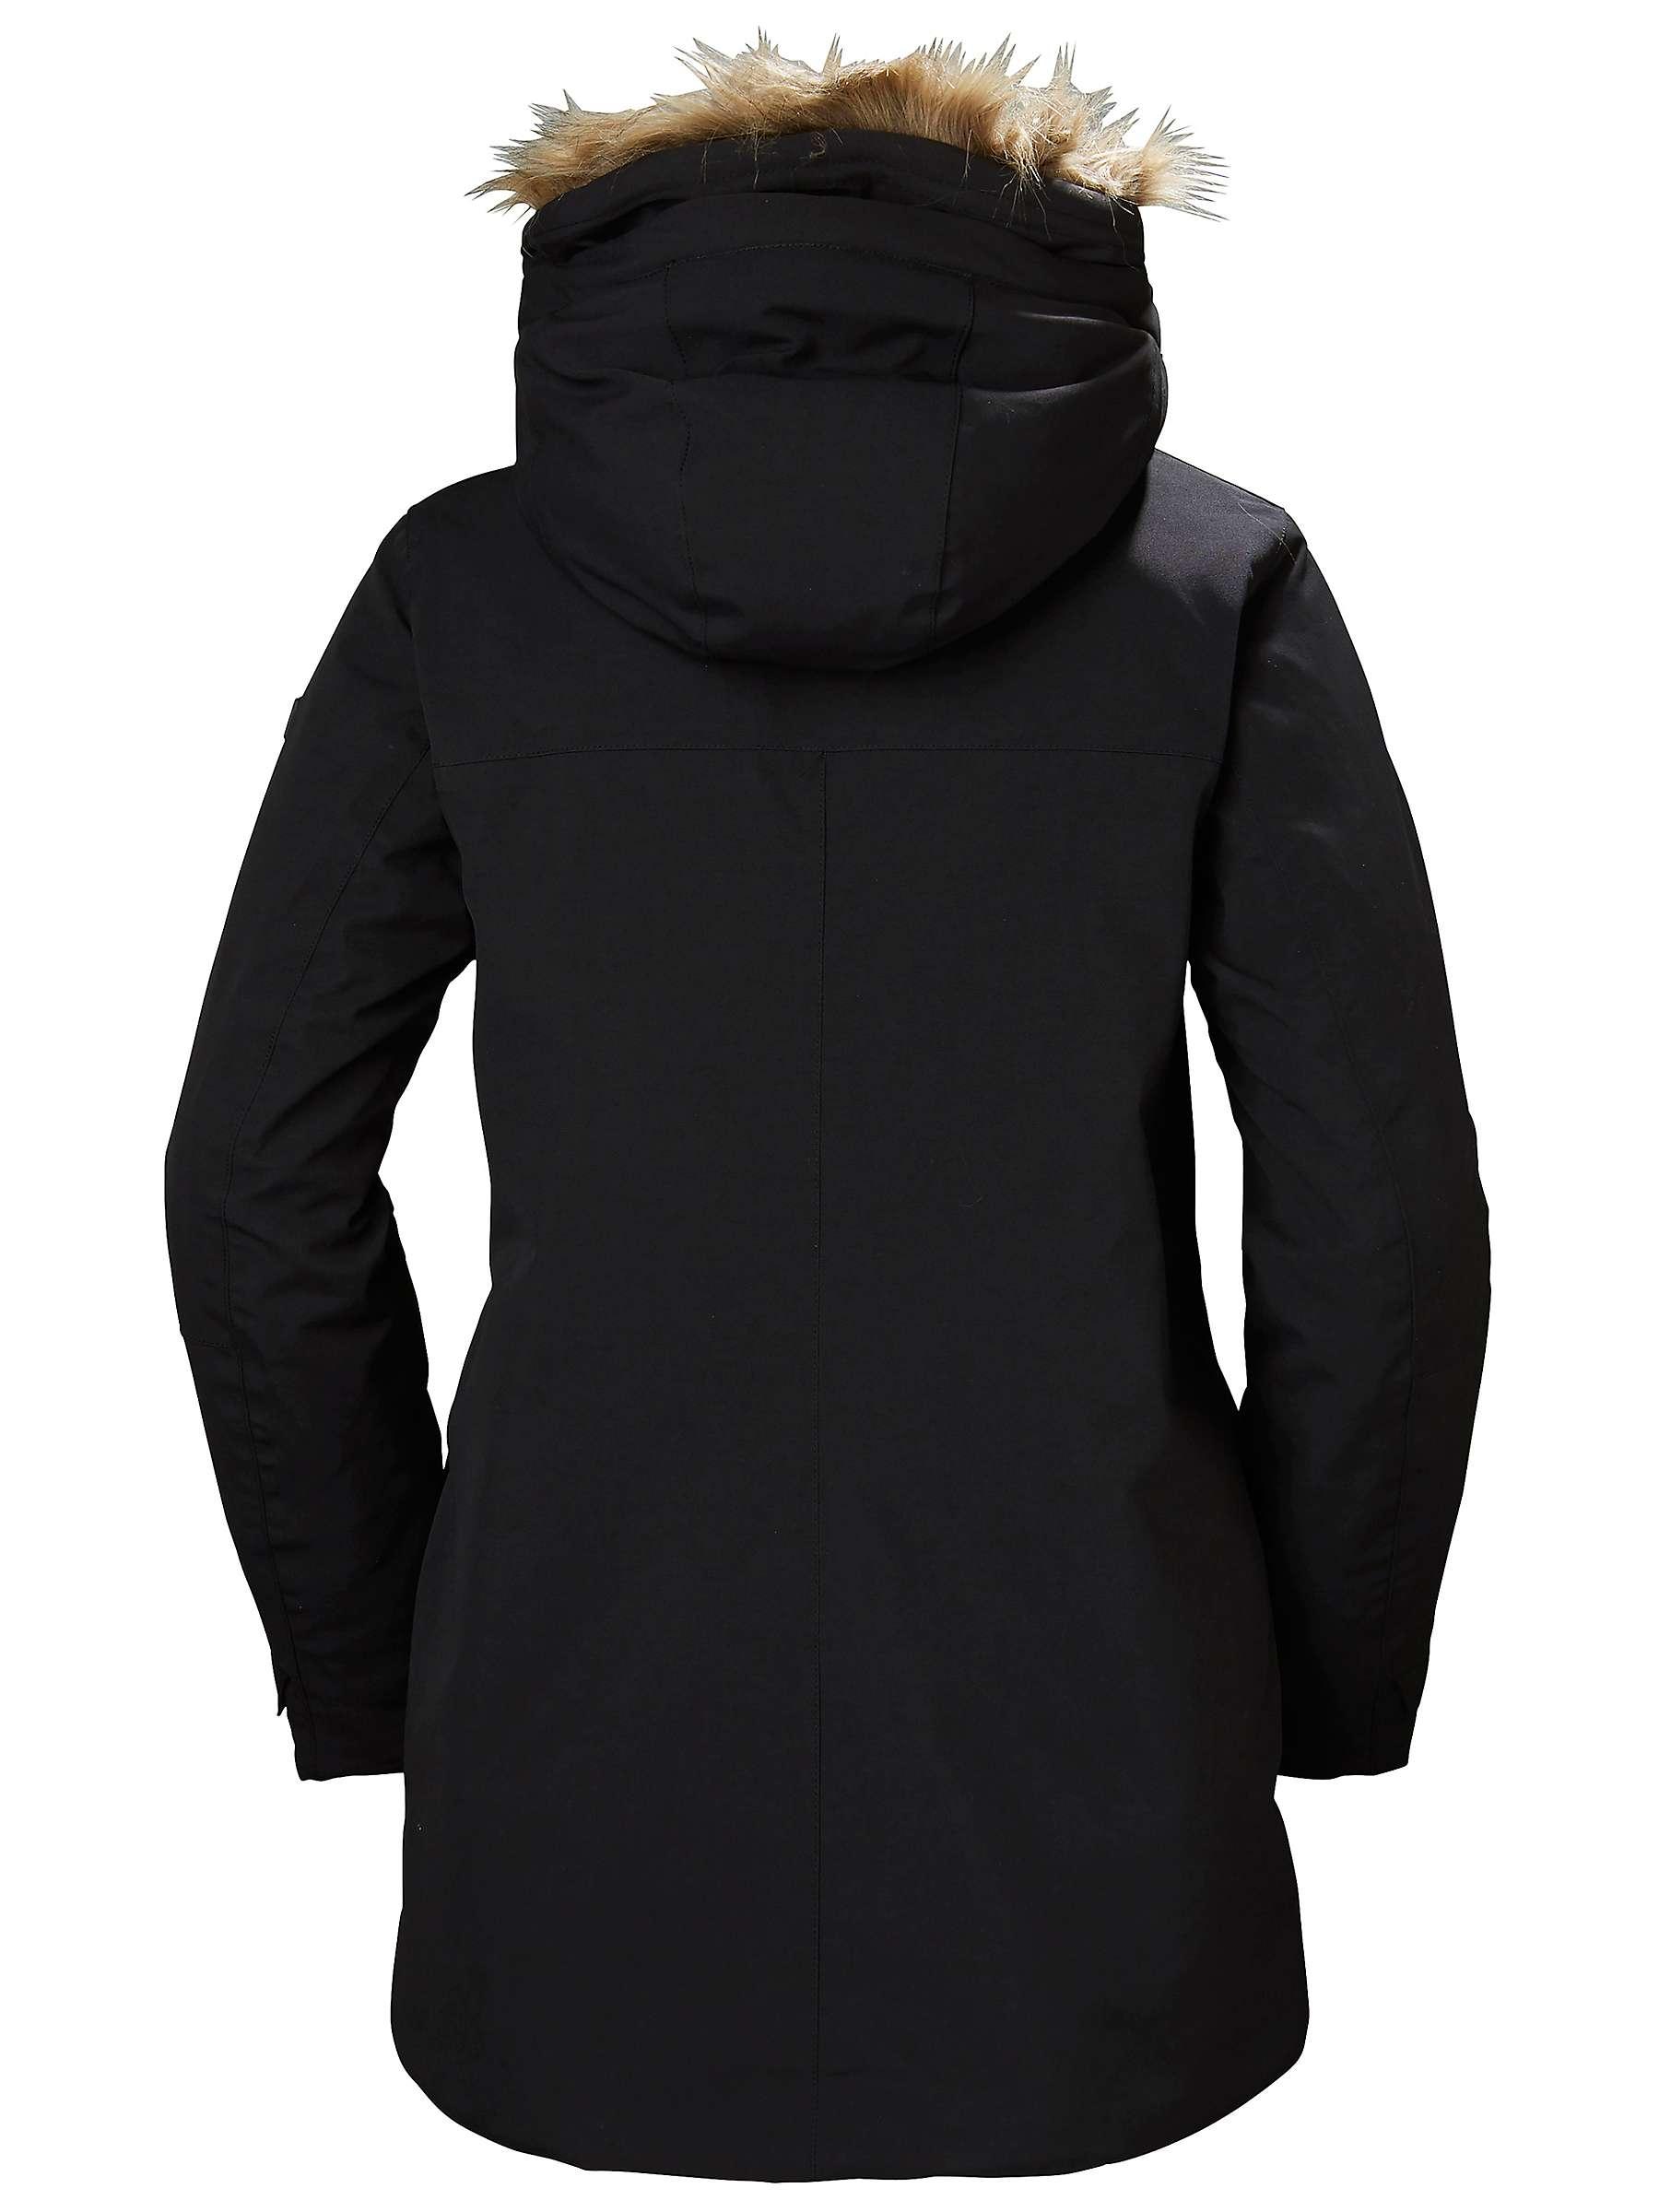 low price sale sleek select for genuine Helly Hansen Svalbard Women's Parka Jacket, Black at John ...